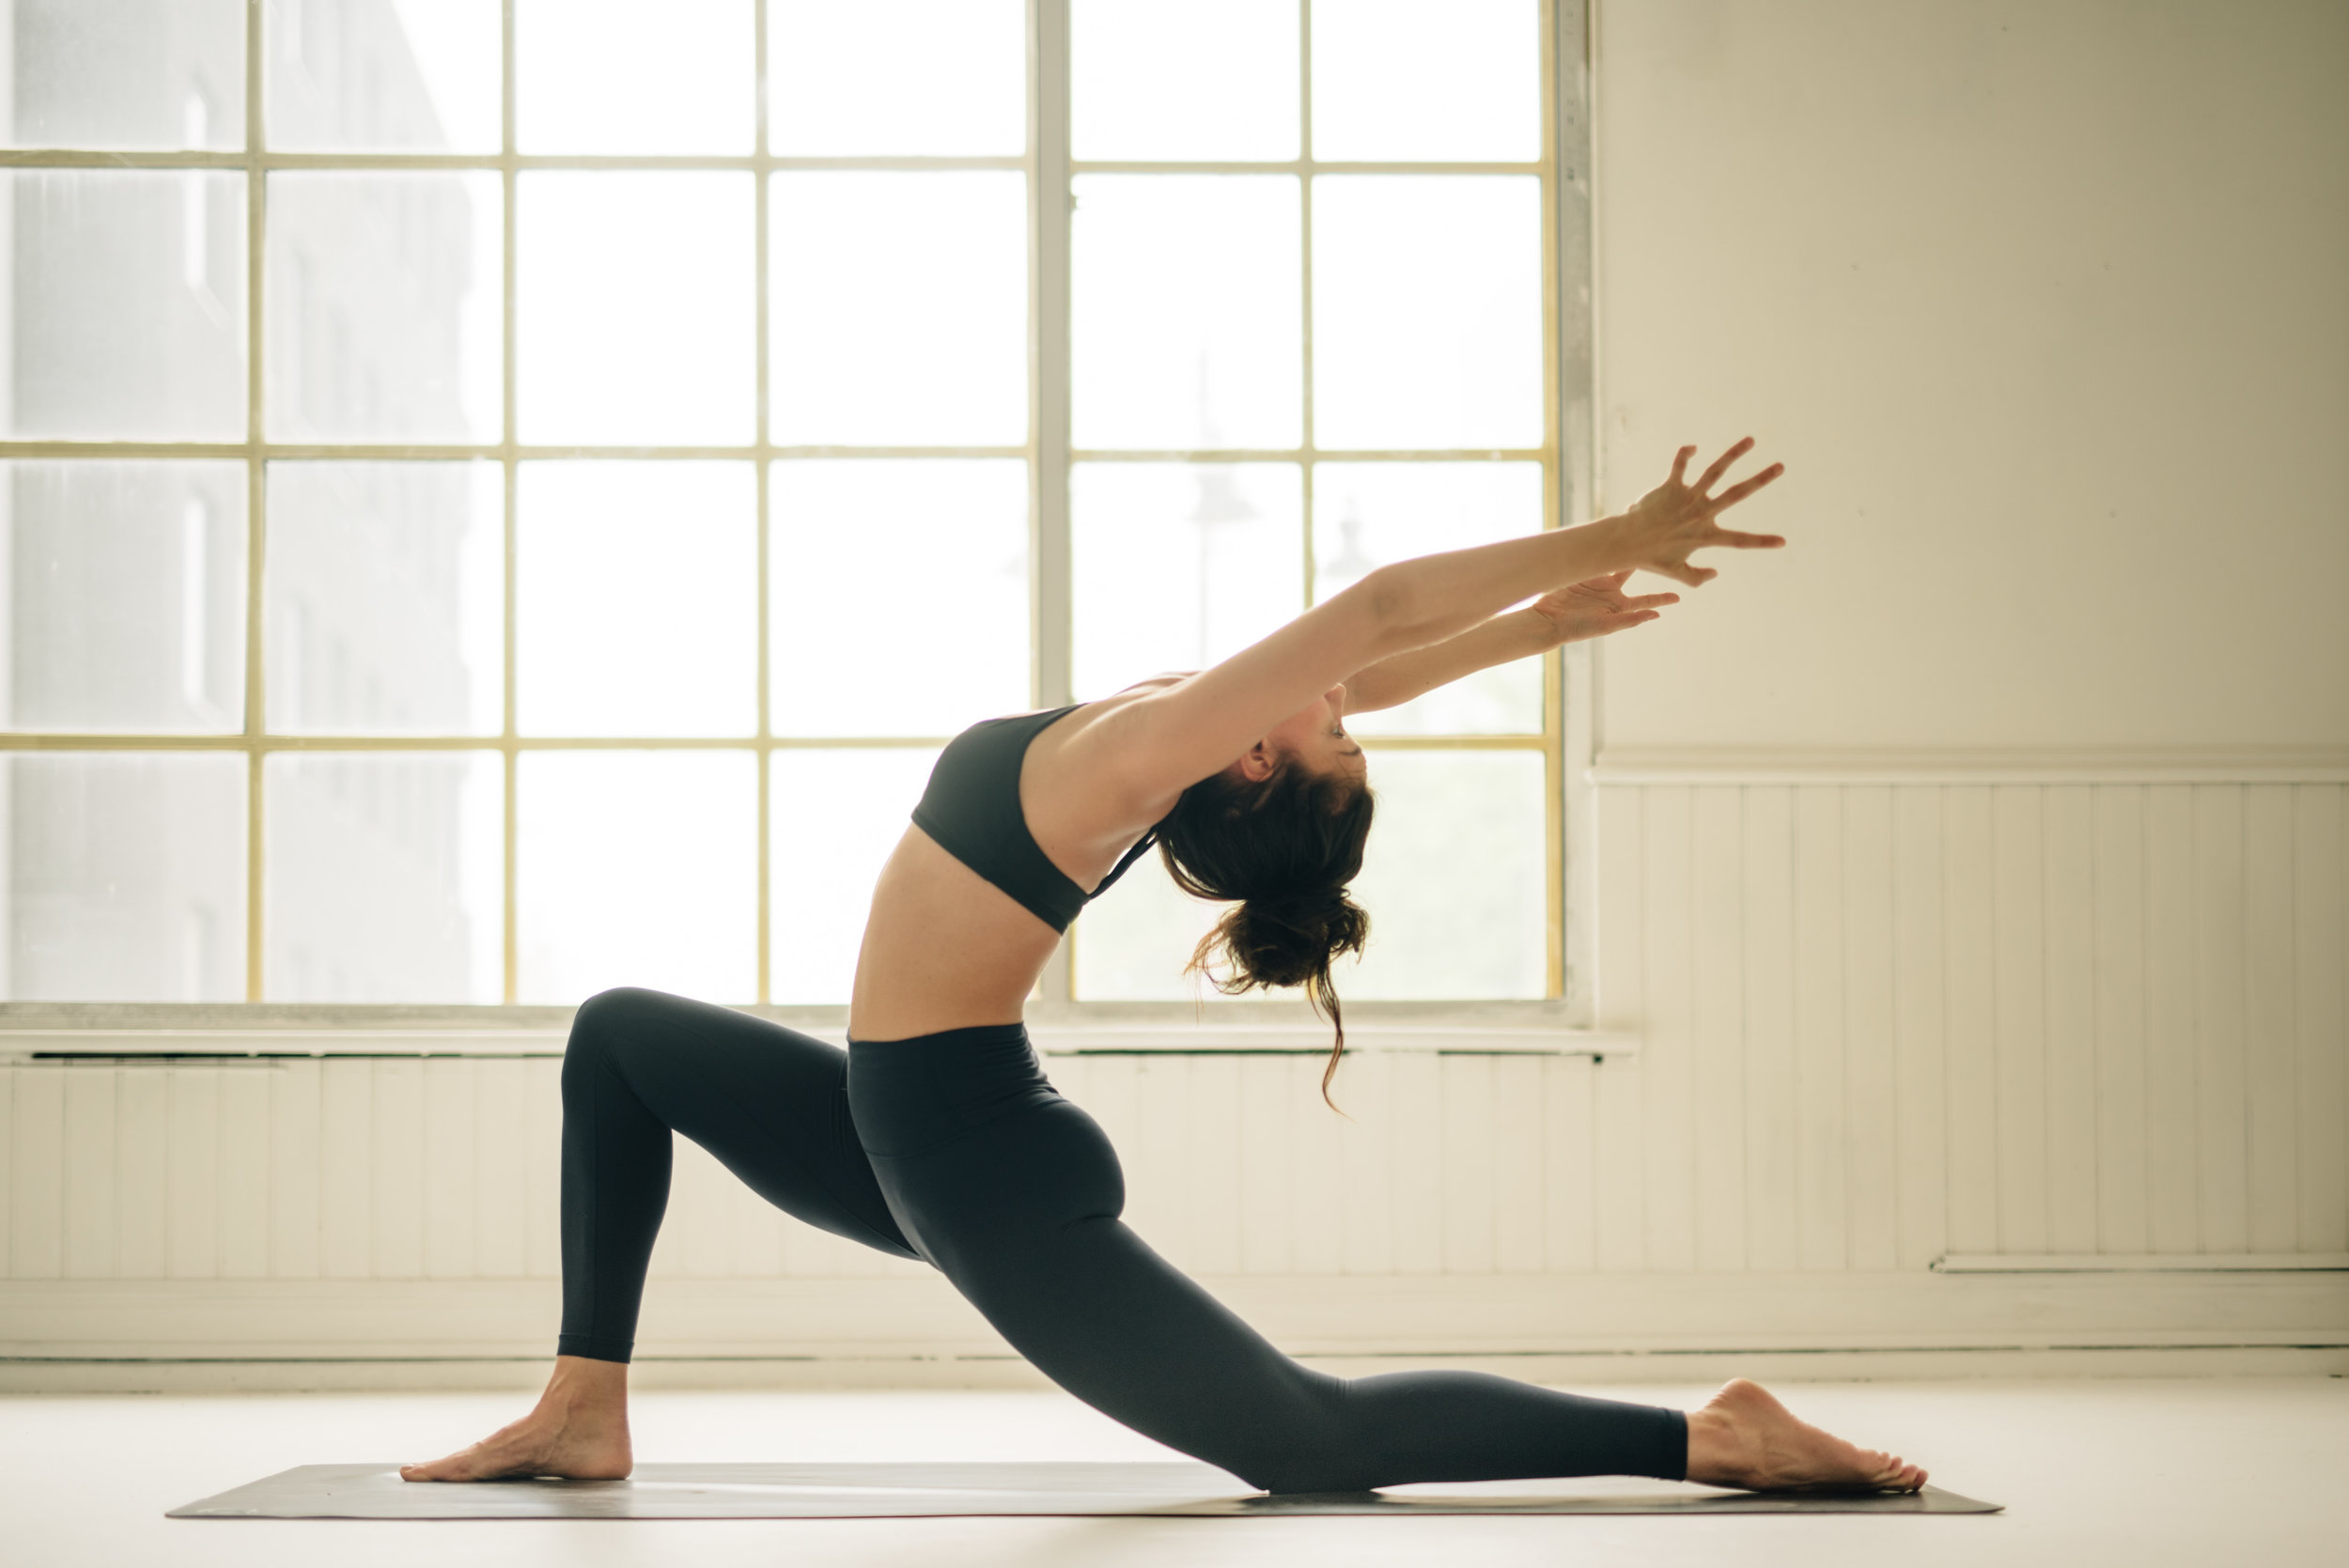 Renee-Yoga-July2019-JenniferMcCord-Edits-213 10.24.22 AM.jpg